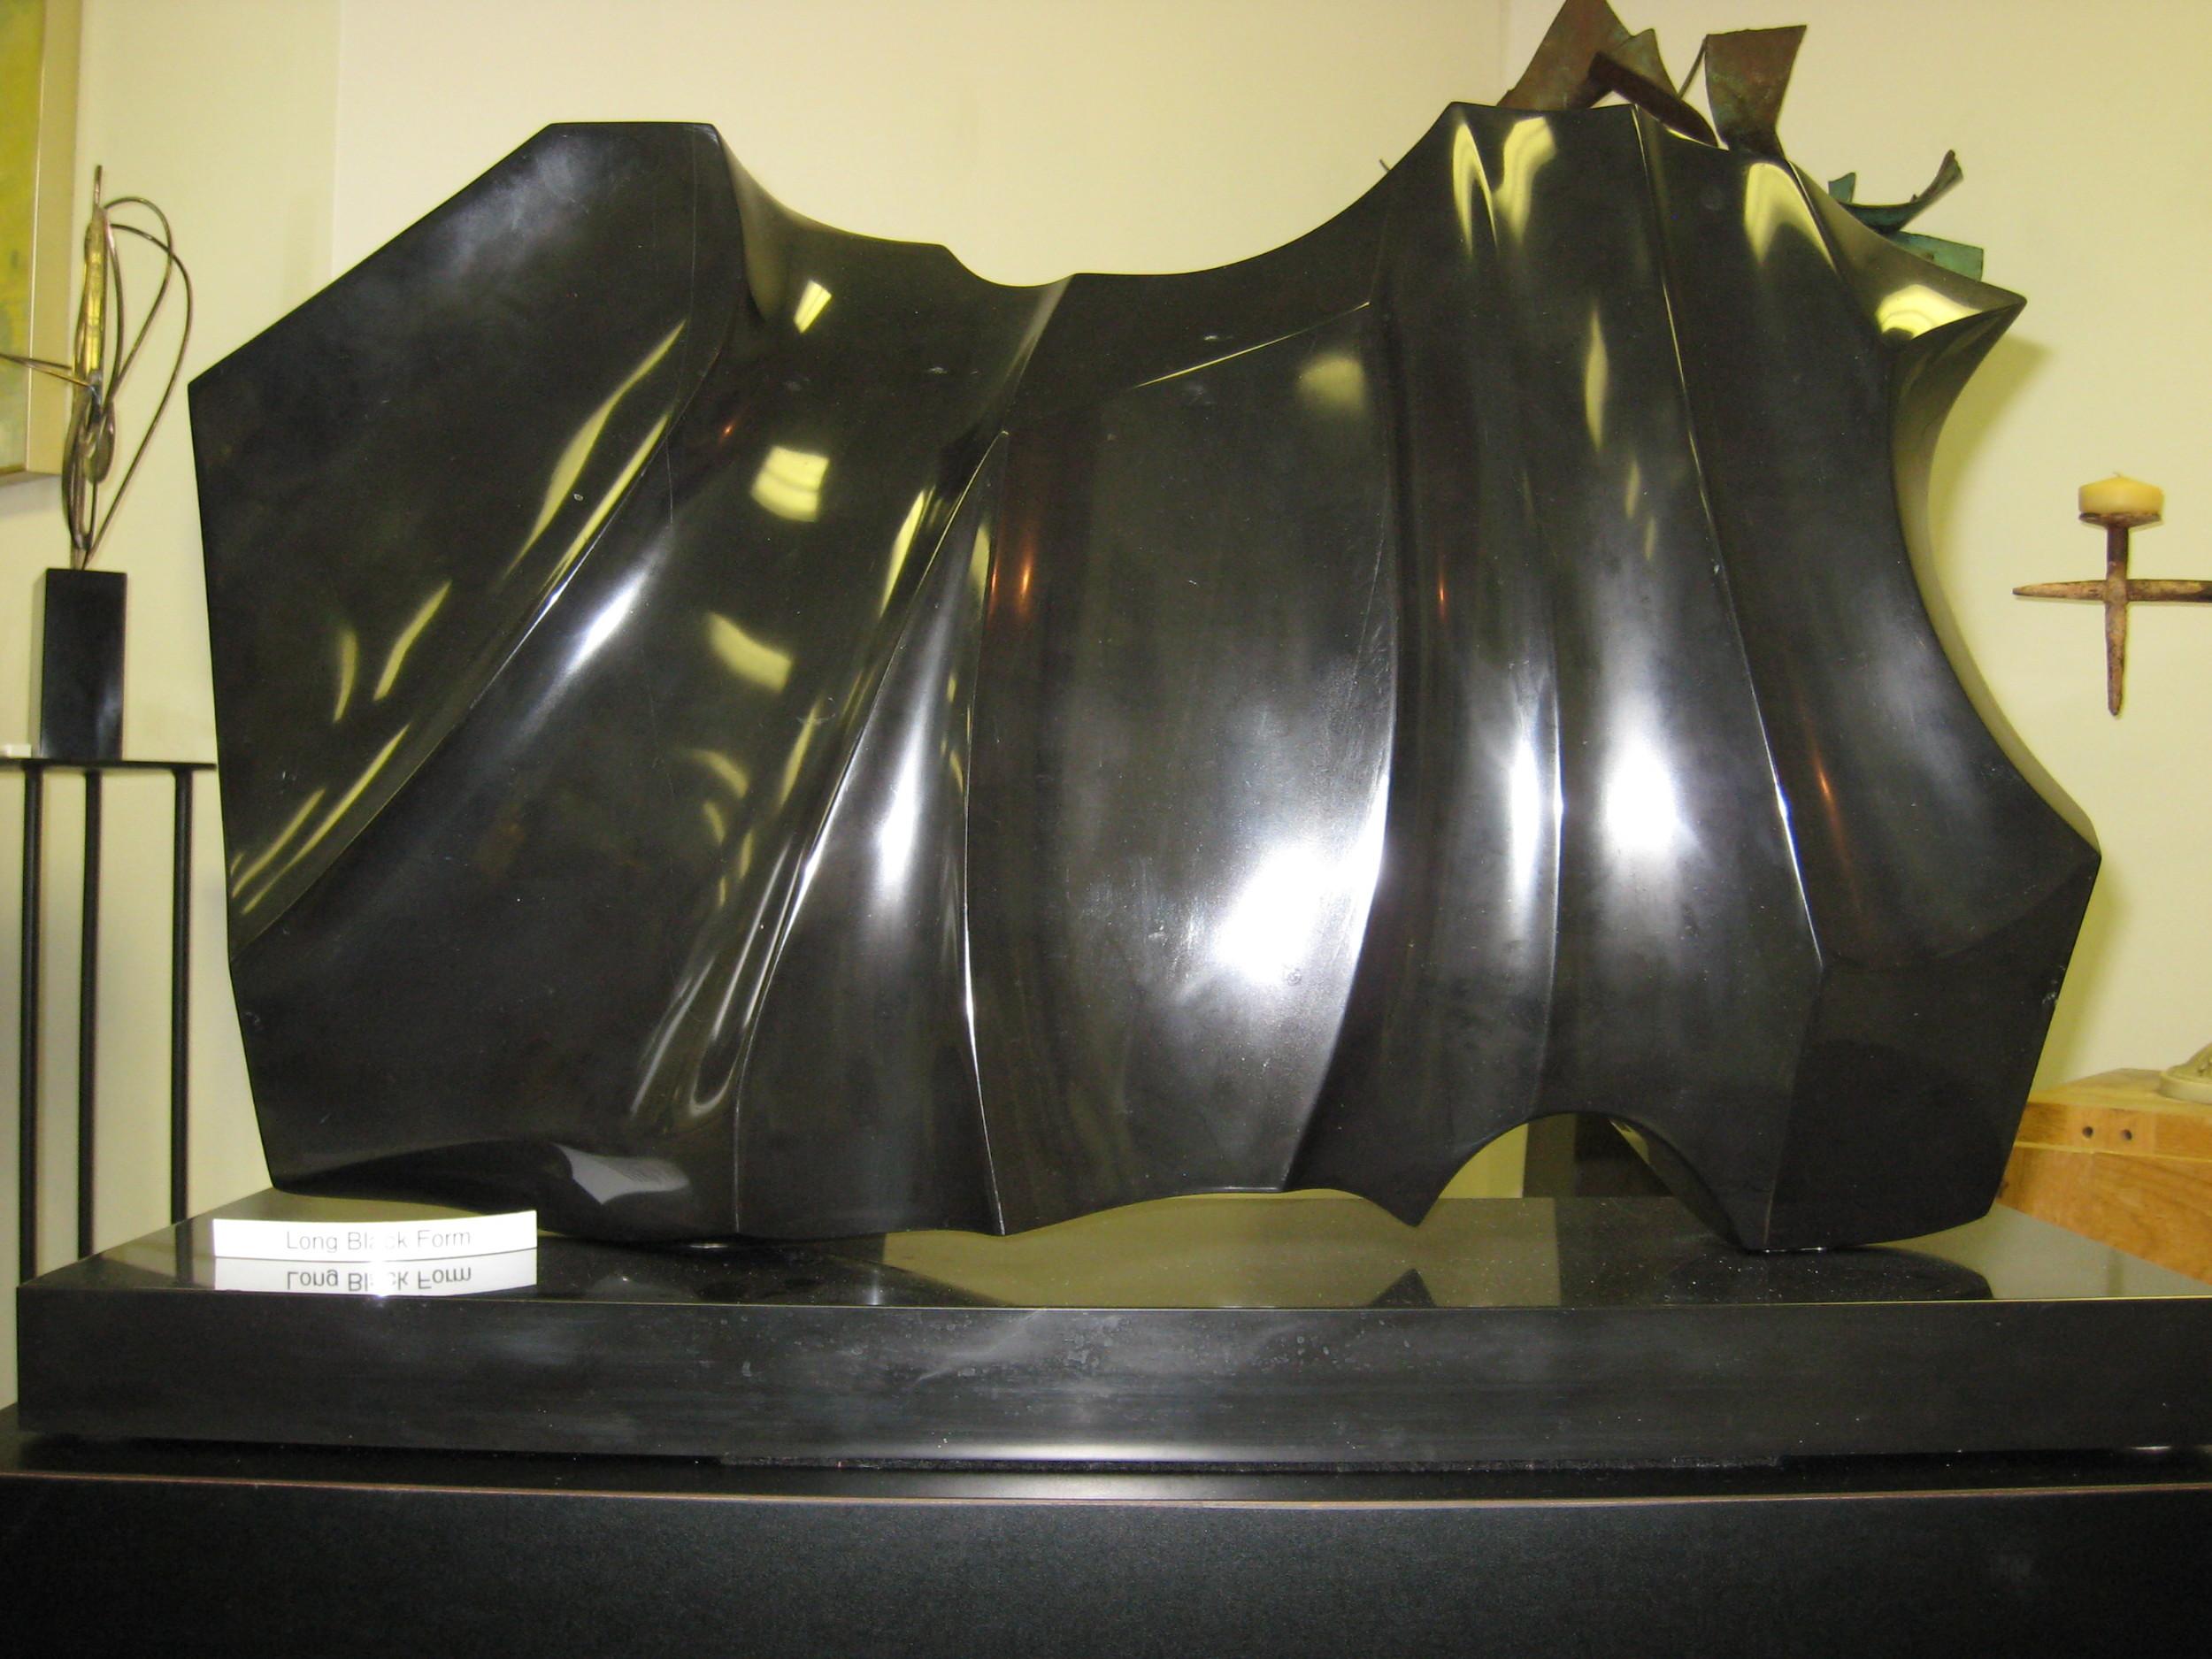 Long Black Form